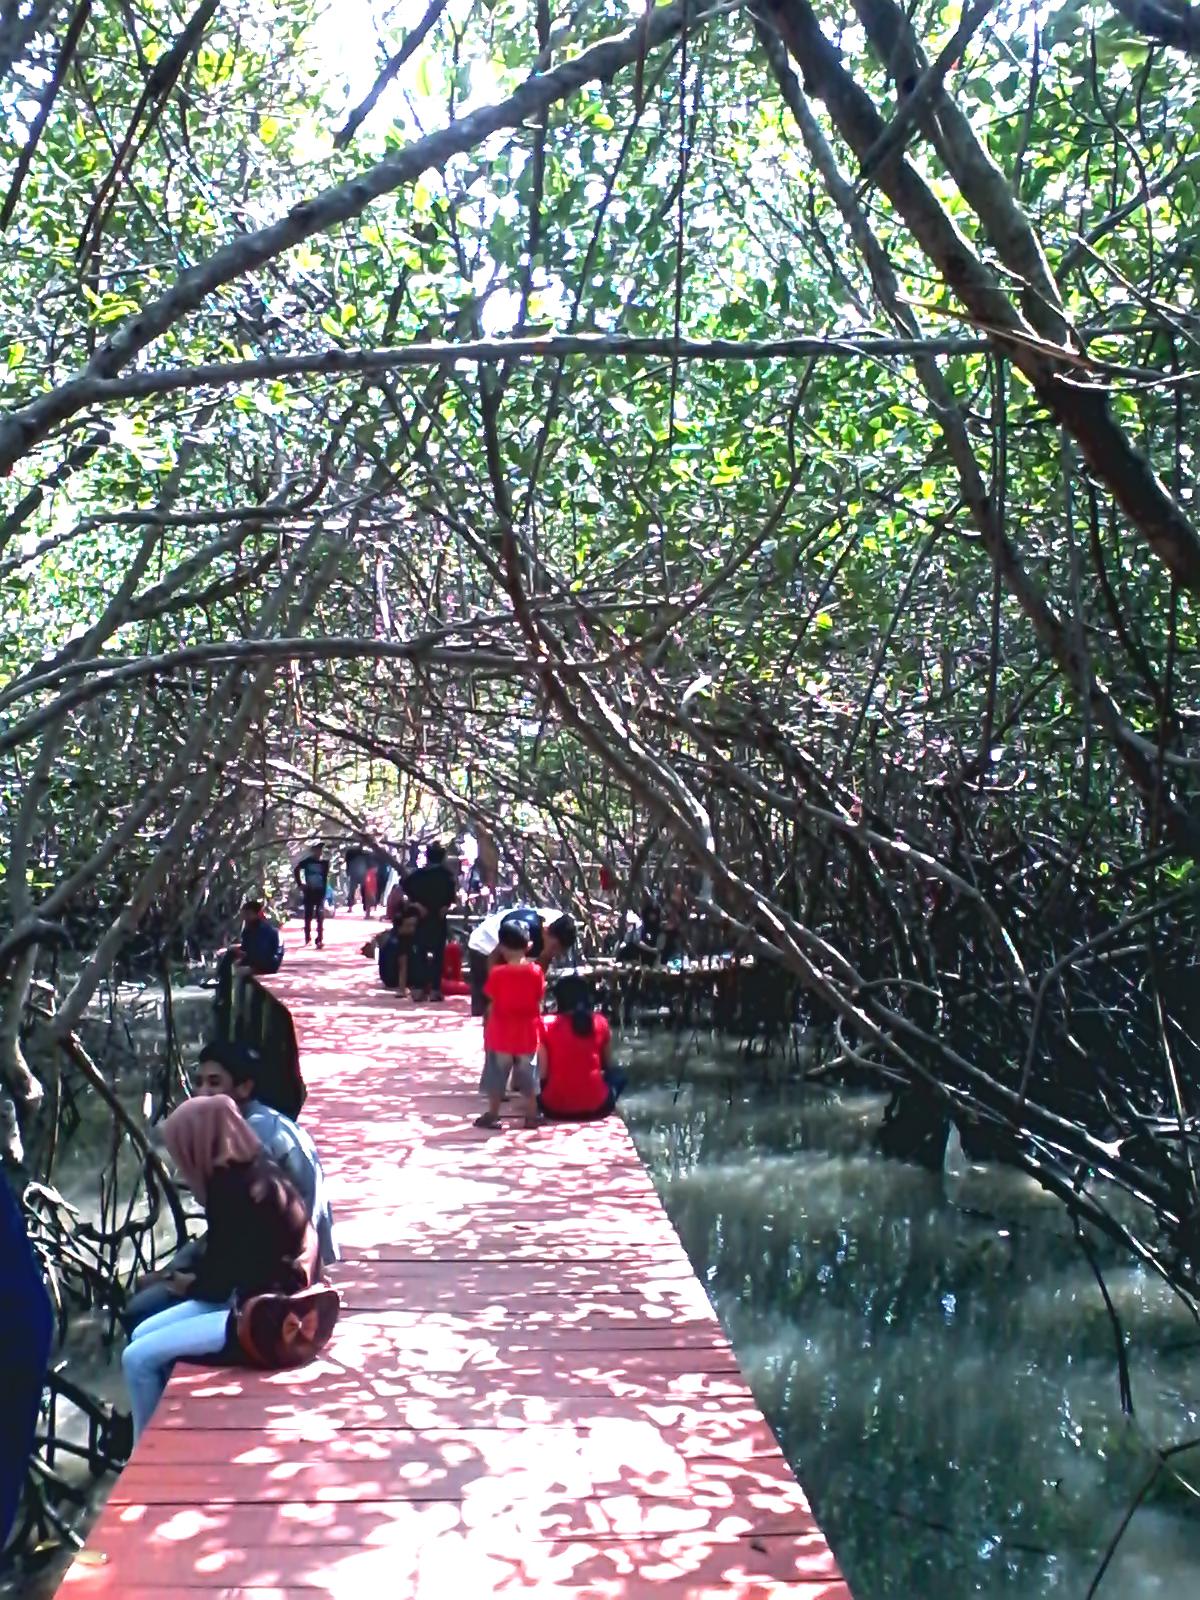 Find Destination Taman Konservasi Hutan Bakau Jembatan Merah Rembang Mangrove